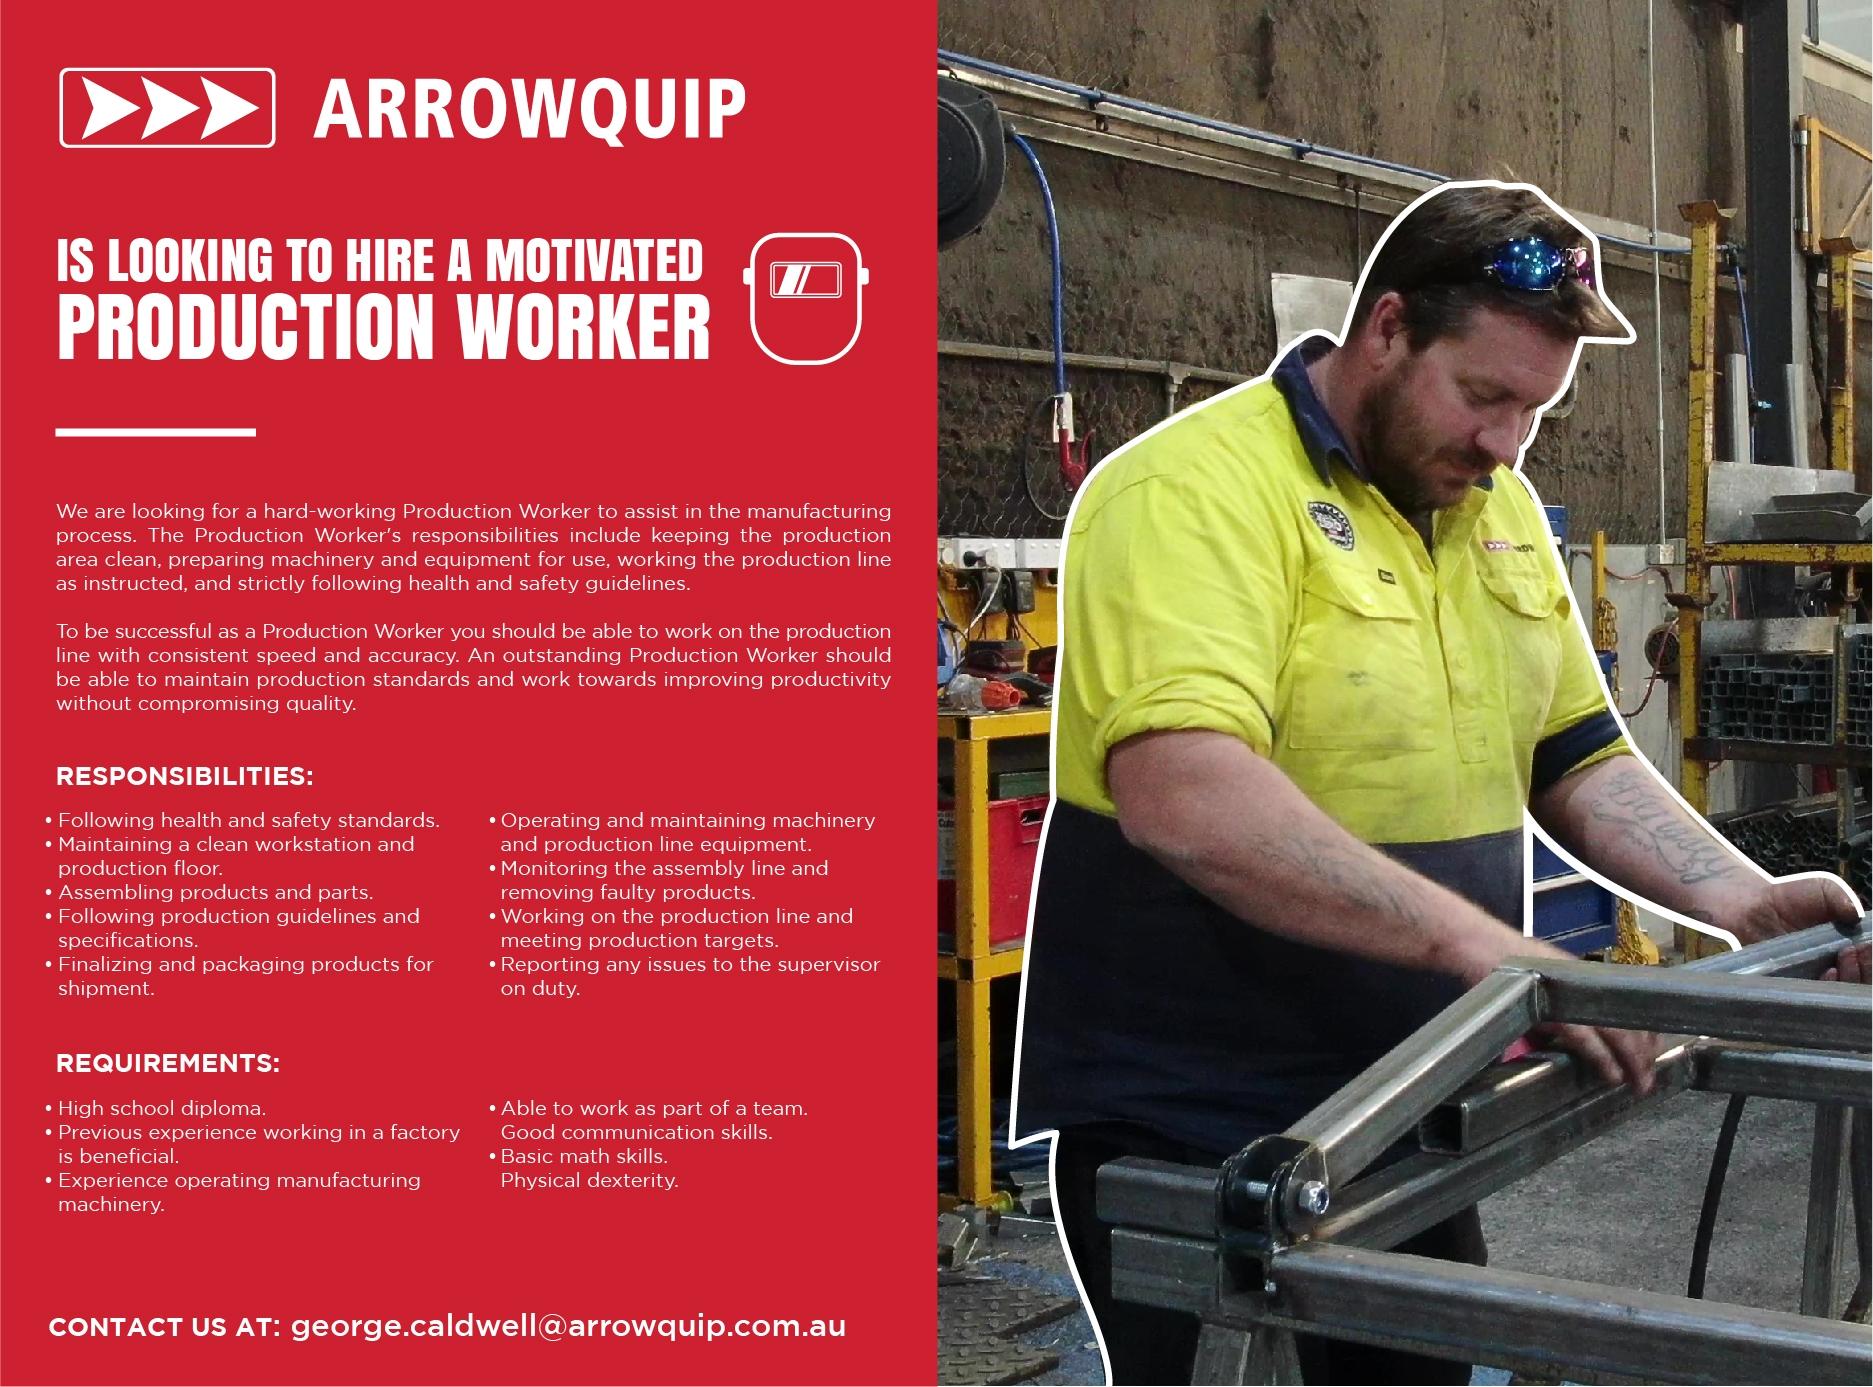 Production-Line-Worker.jpg#asset:6021